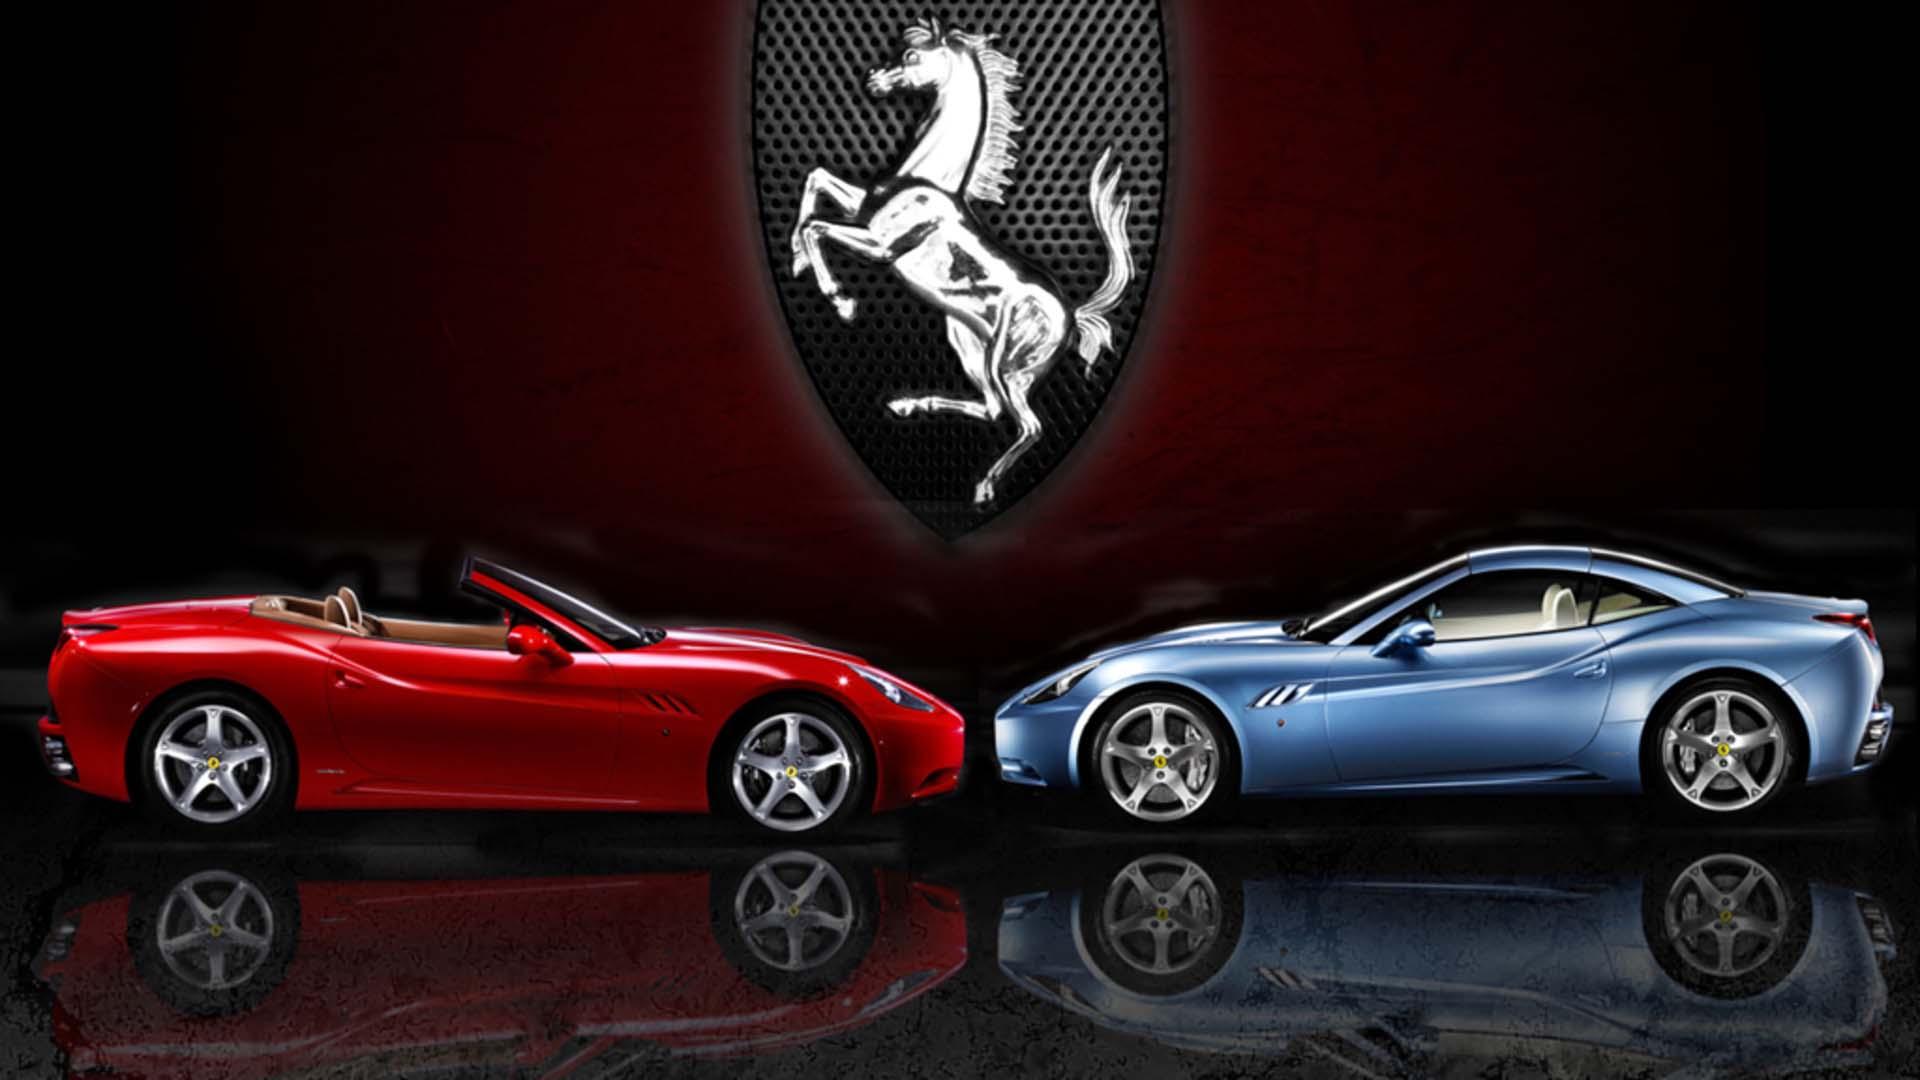 Make 3d Name Wallpaper 42 Hd Ferrari Wallpapers For Free Download